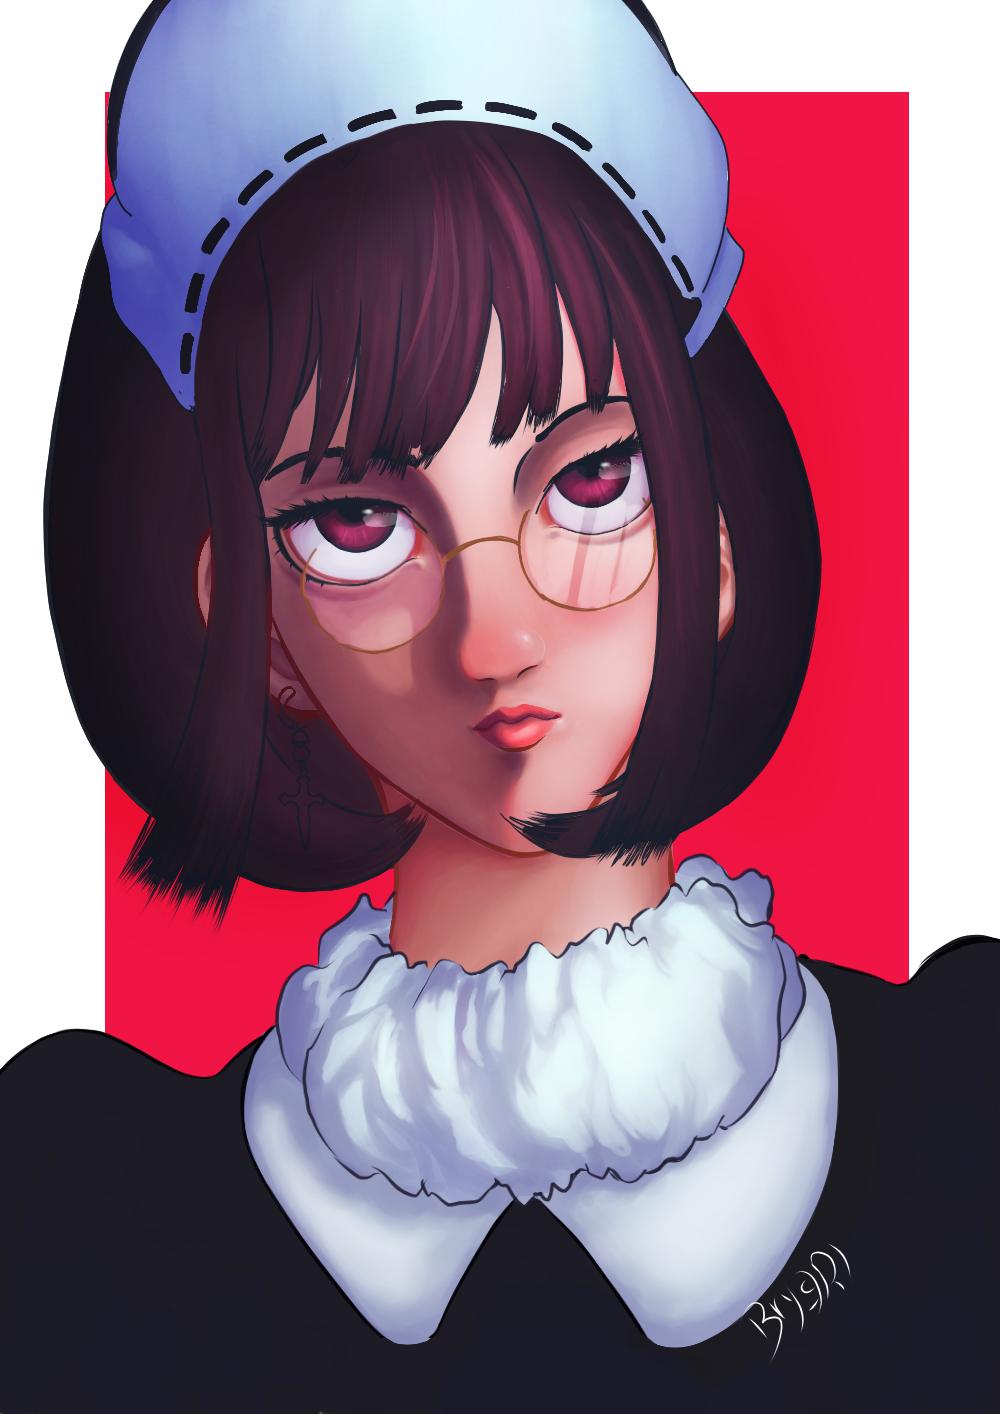 Maid Portrait